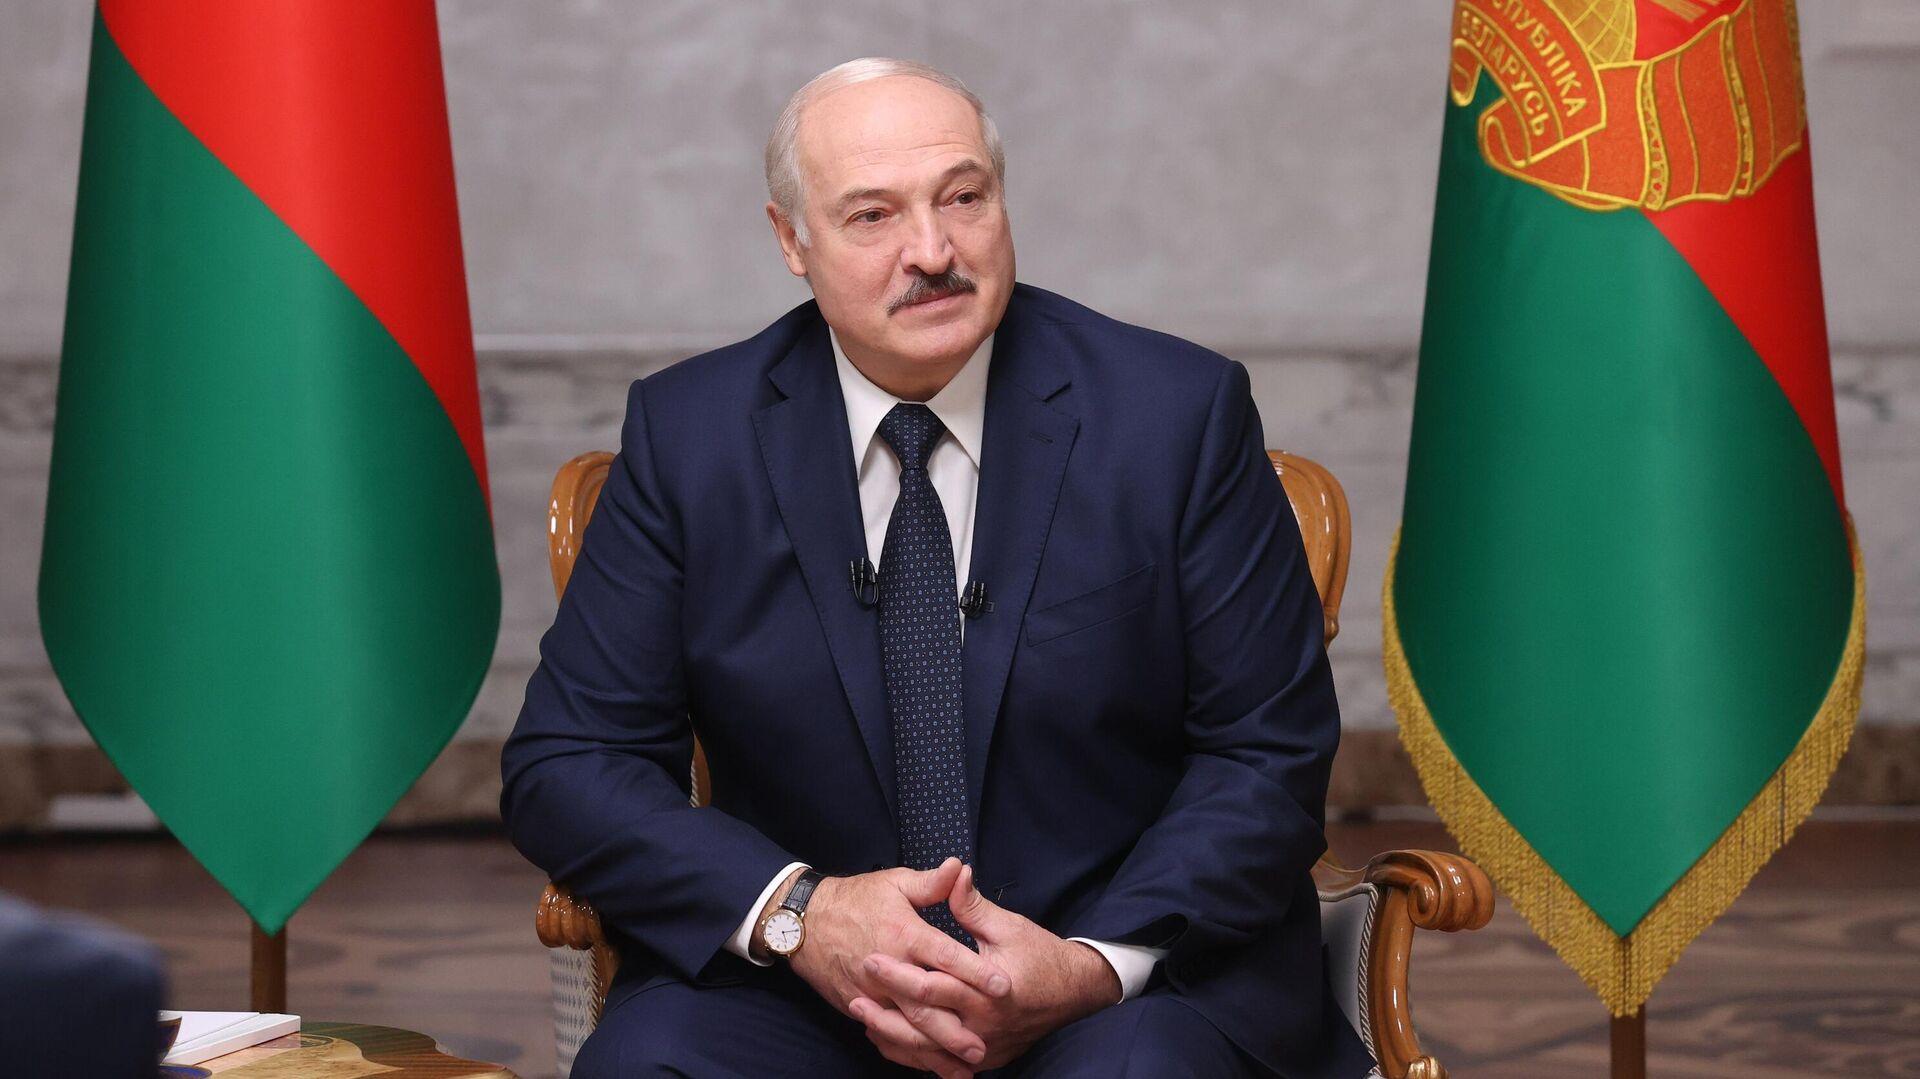 Президент Белоруссии Александр Лукашенко во время интервью российским журналистам во Дворце независимости в Минске - РИА Новости, 1920, 23.09.2020